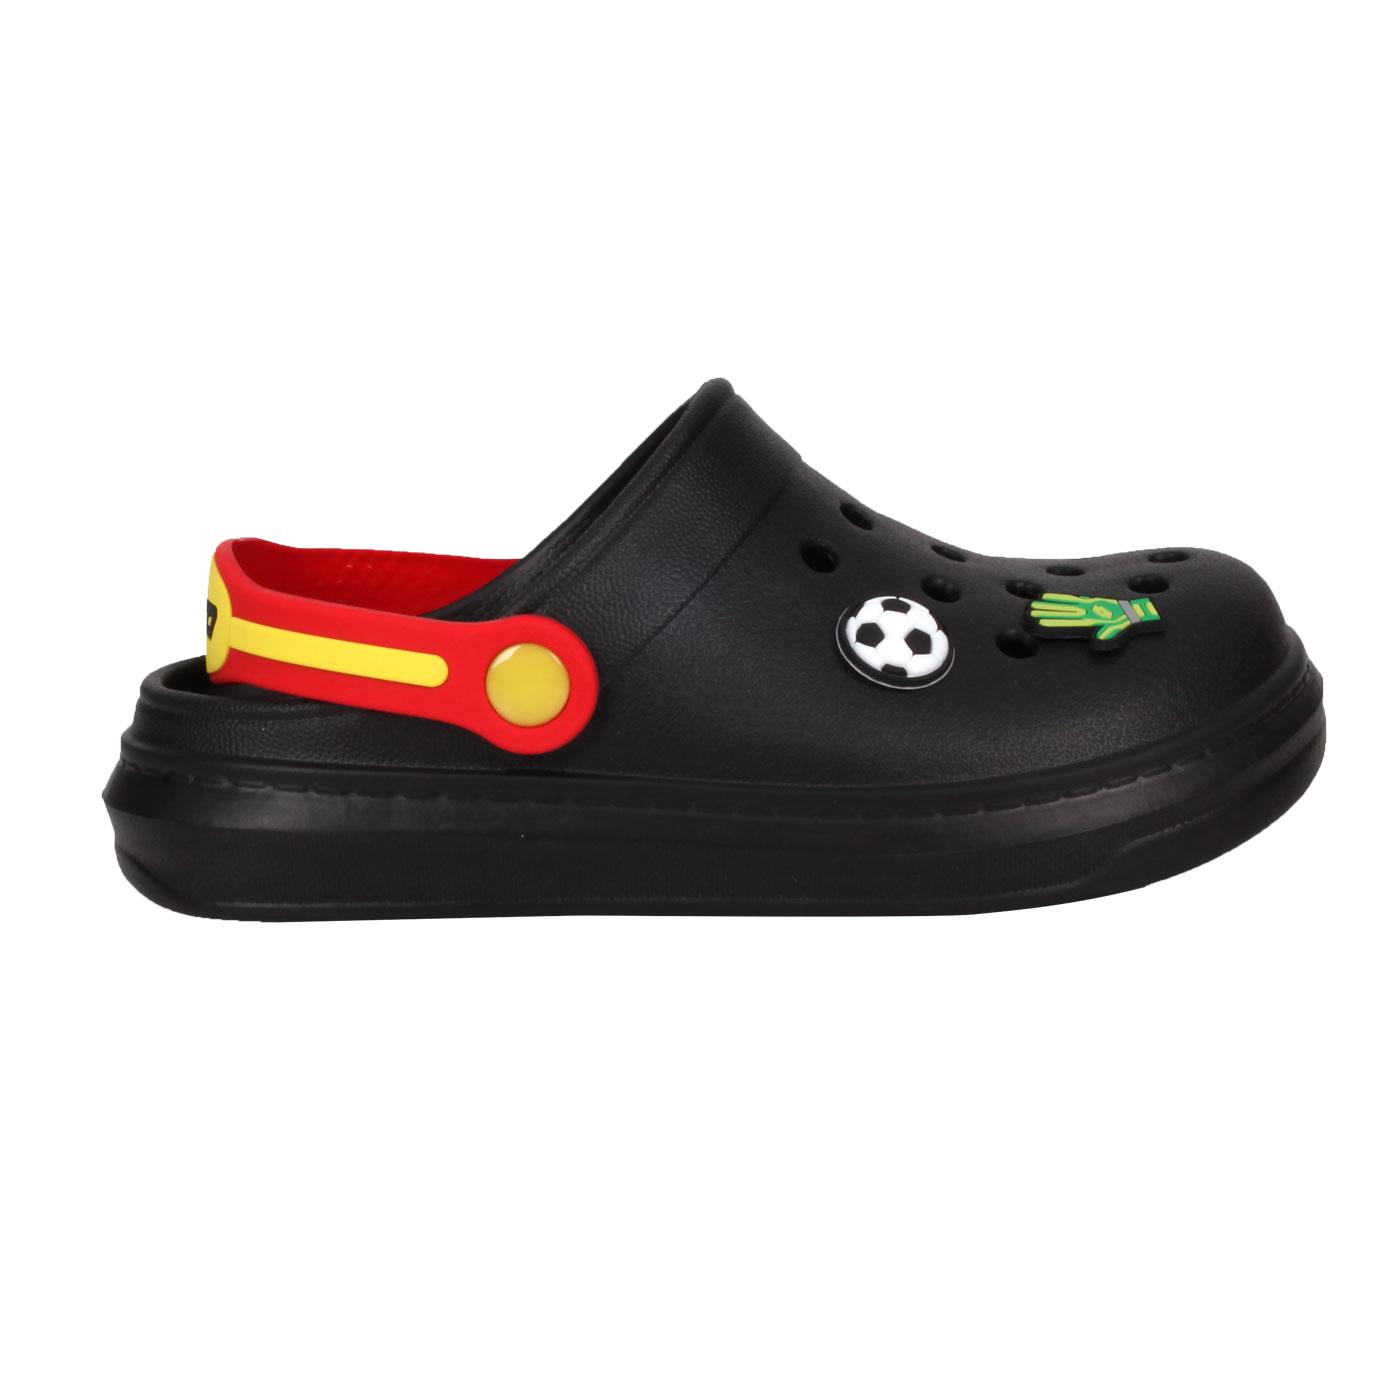 LOTTO 中童FANO清涼拖鞋 LT1AKS3080 - 黑紅黃白綠